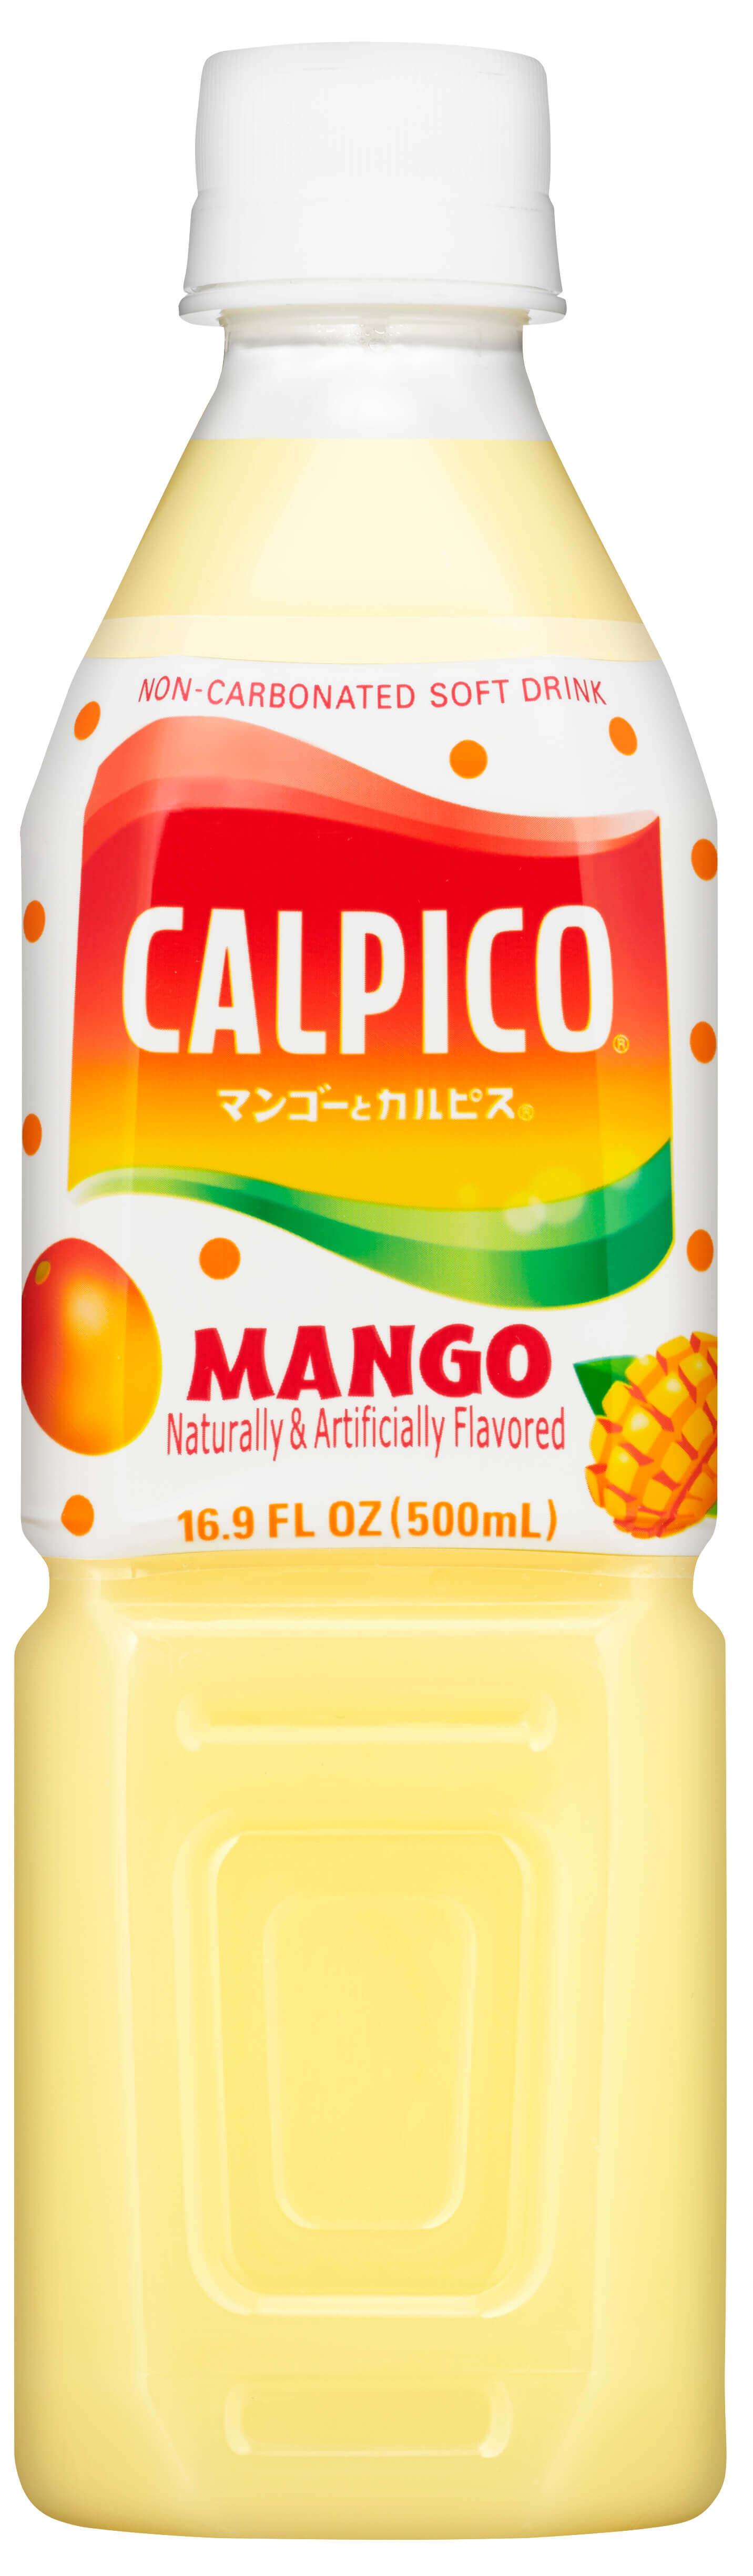 Calpico Mango